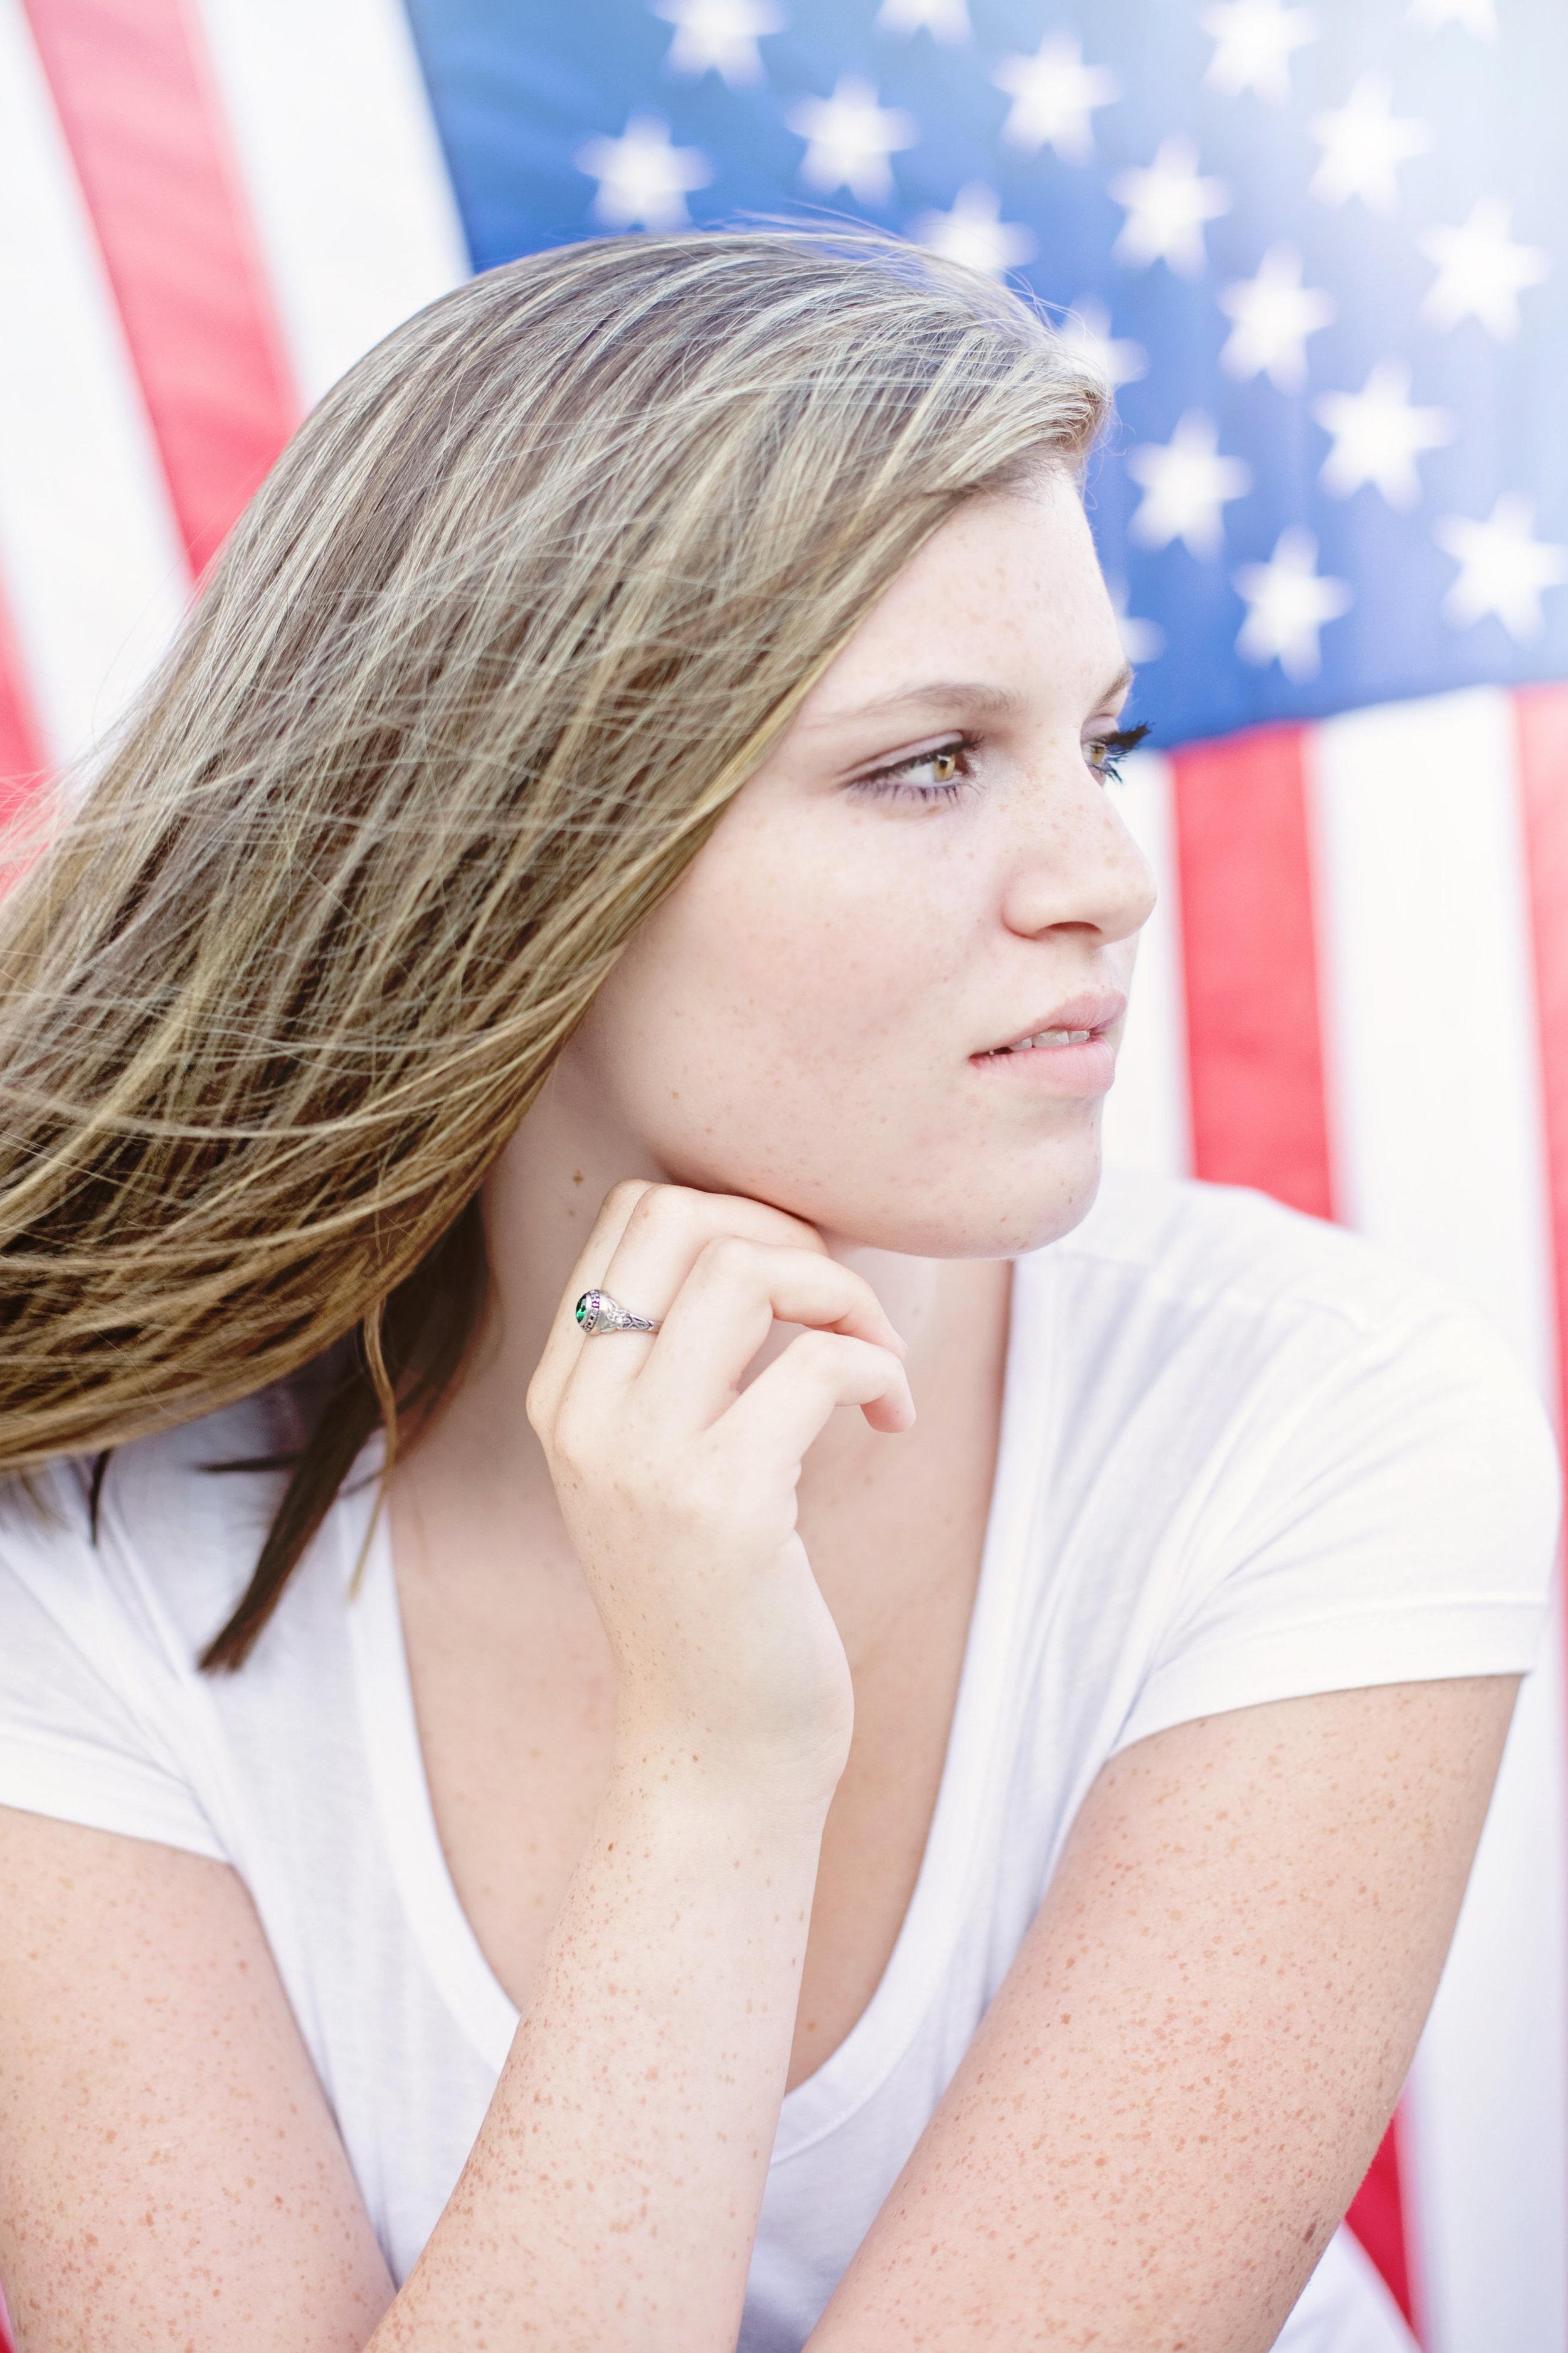 pickens seneca senior portrait photographer photography